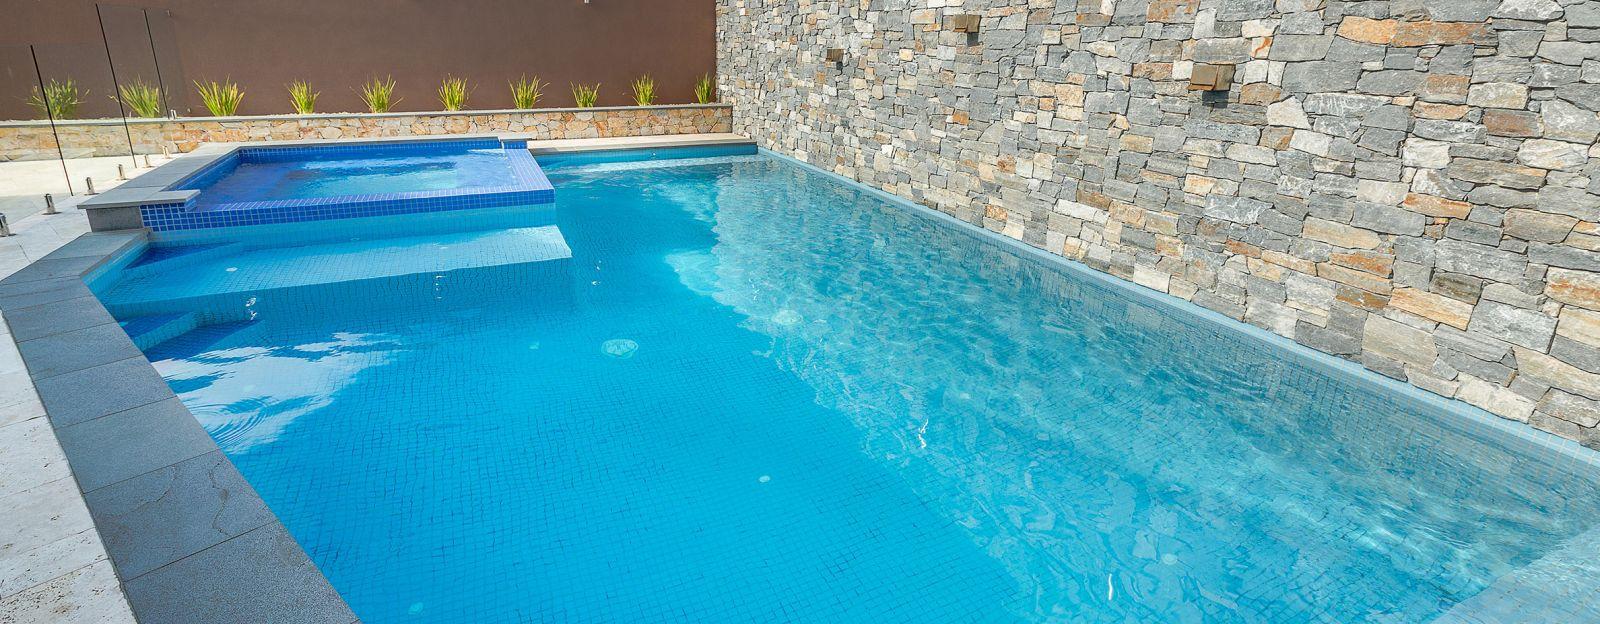 Pools For Small Spaces Melbourne Australia Eco Pools Spas